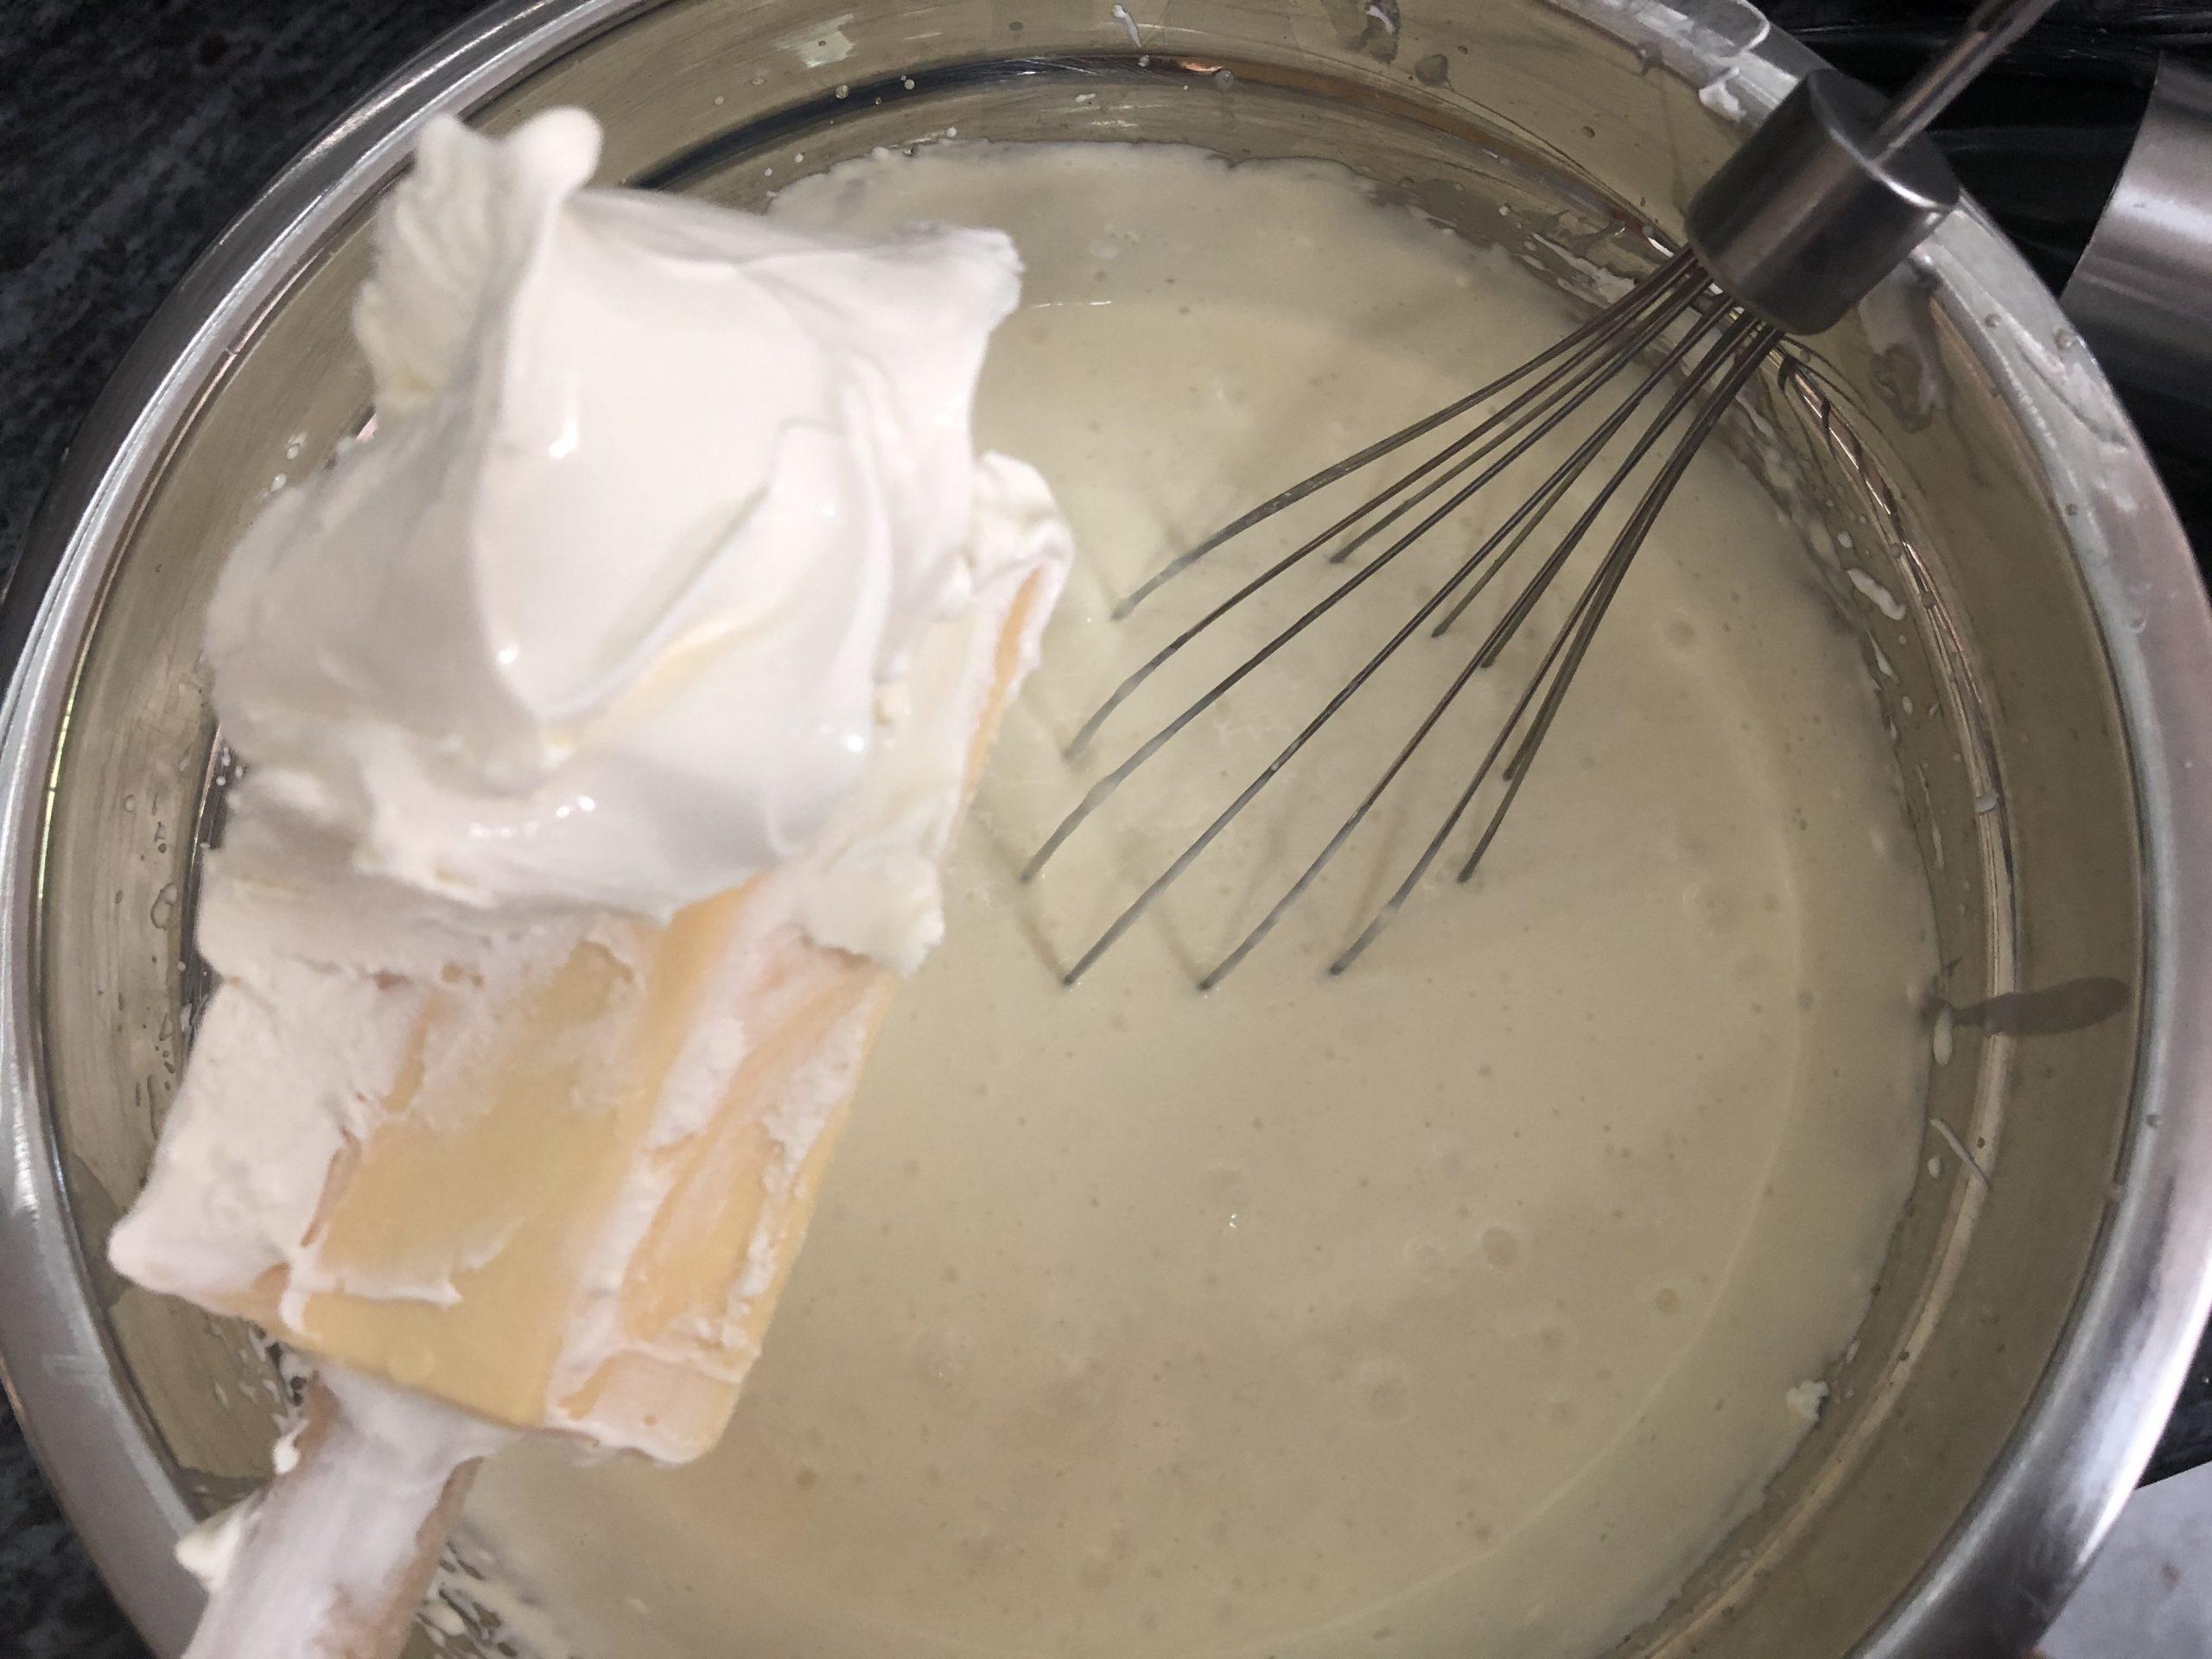 Adding mascarpone